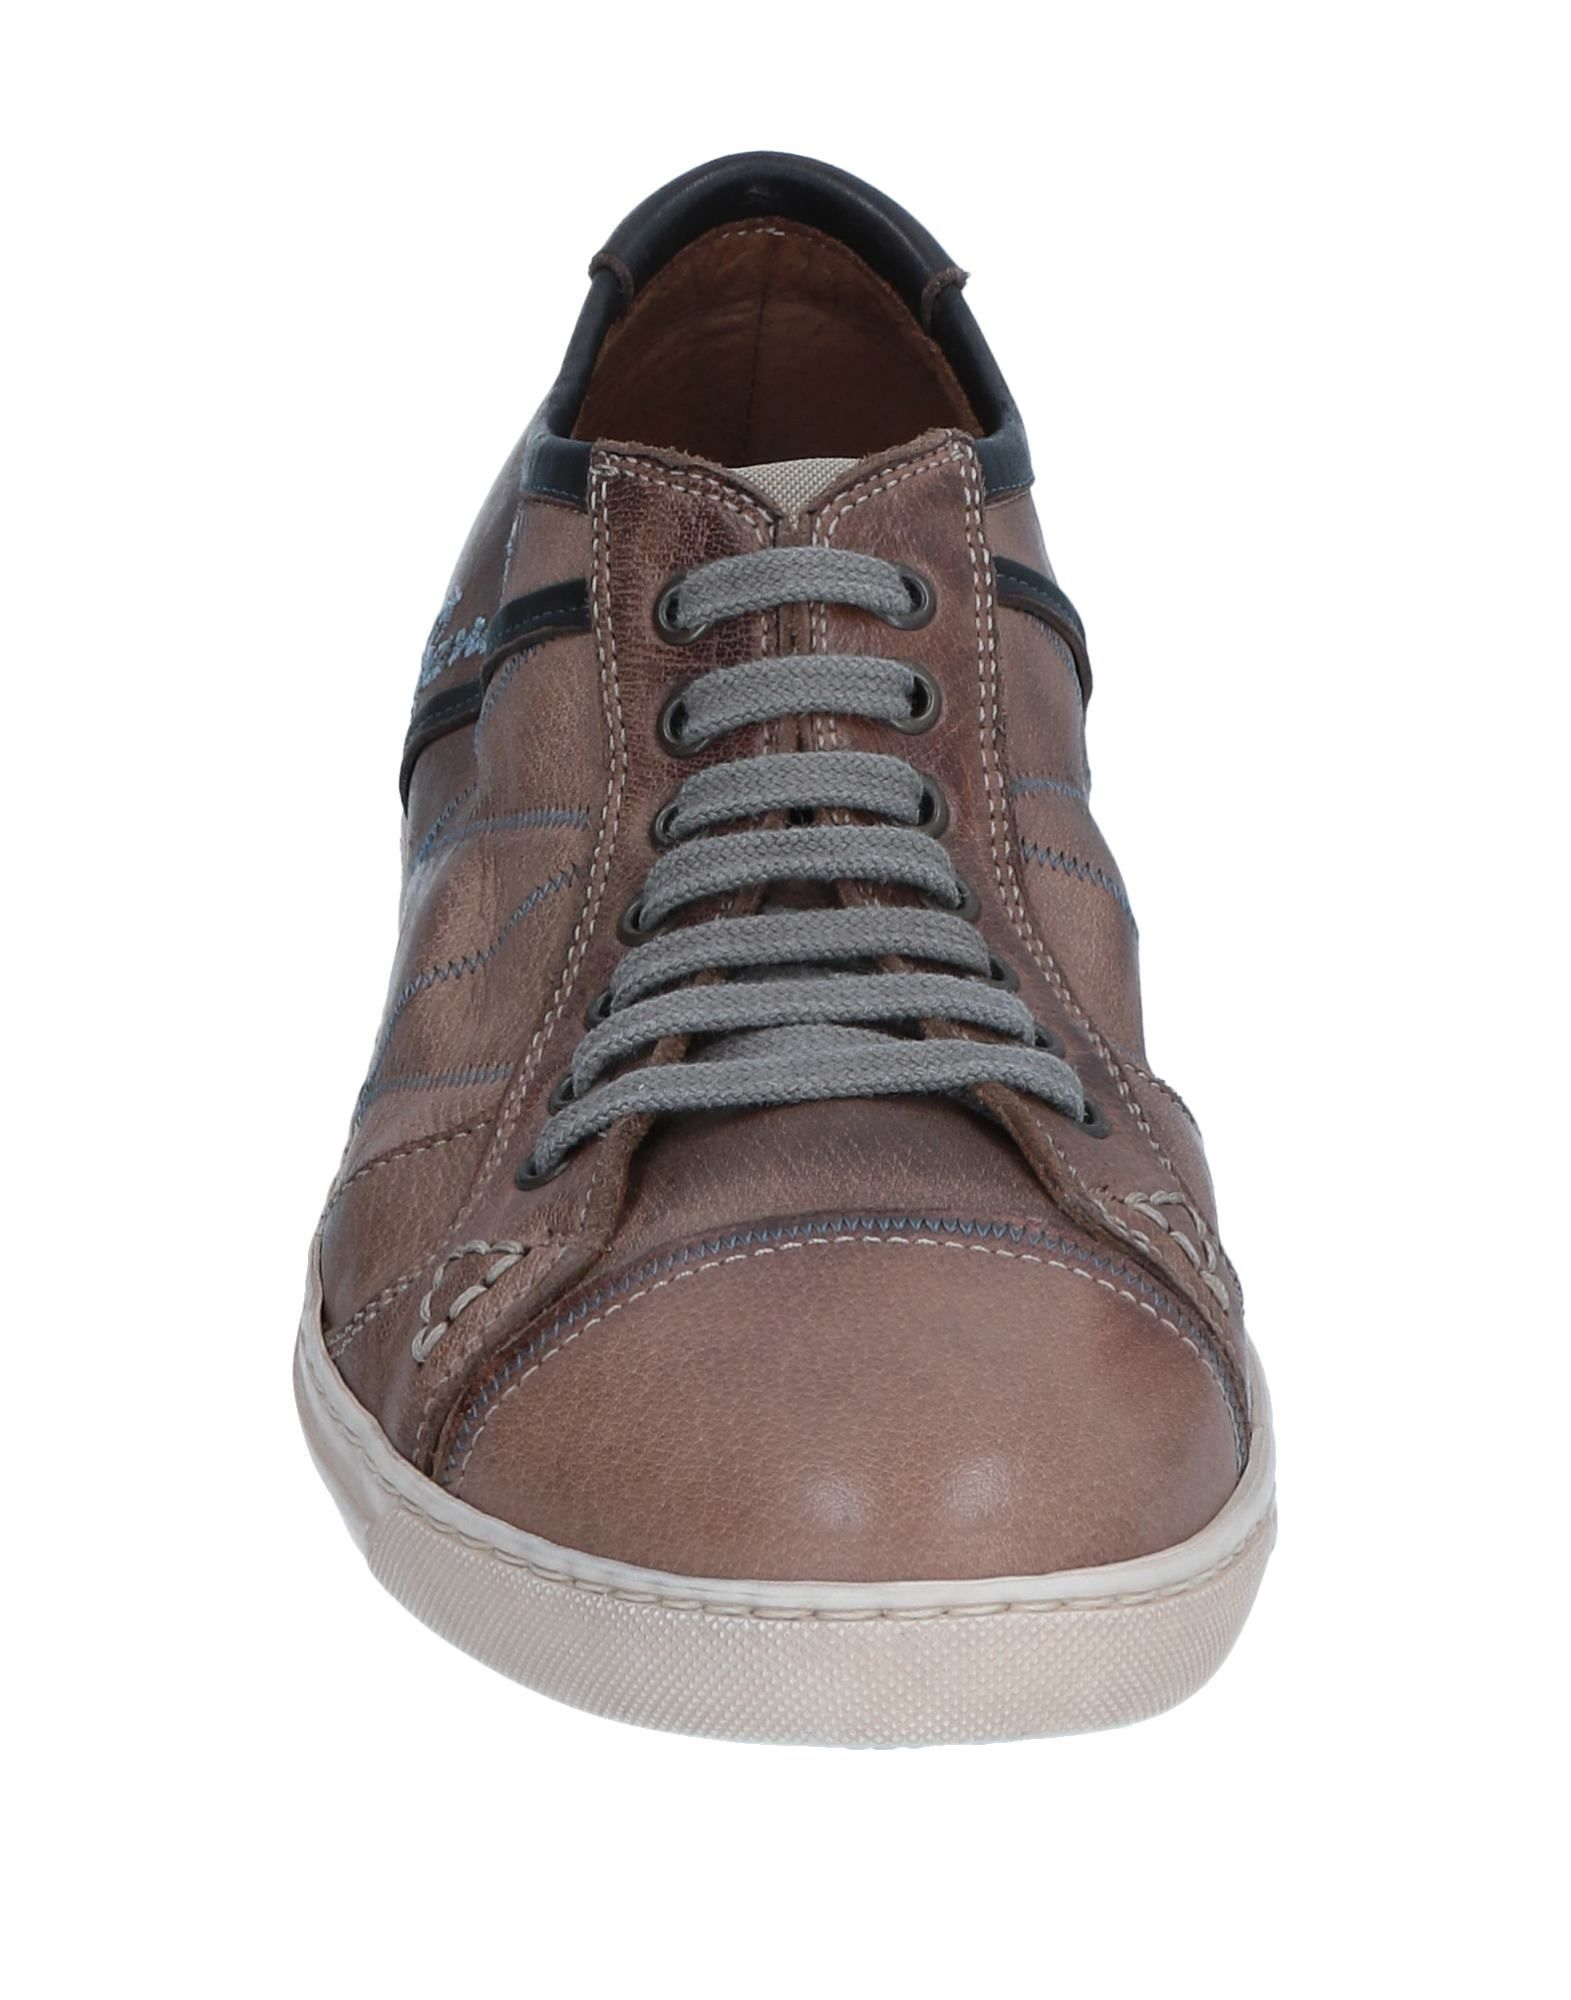 Barracuda Sneakers Herren  44487861NM Schuhe Gute Qualität beliebte Schuhe 44487861NM 96c656